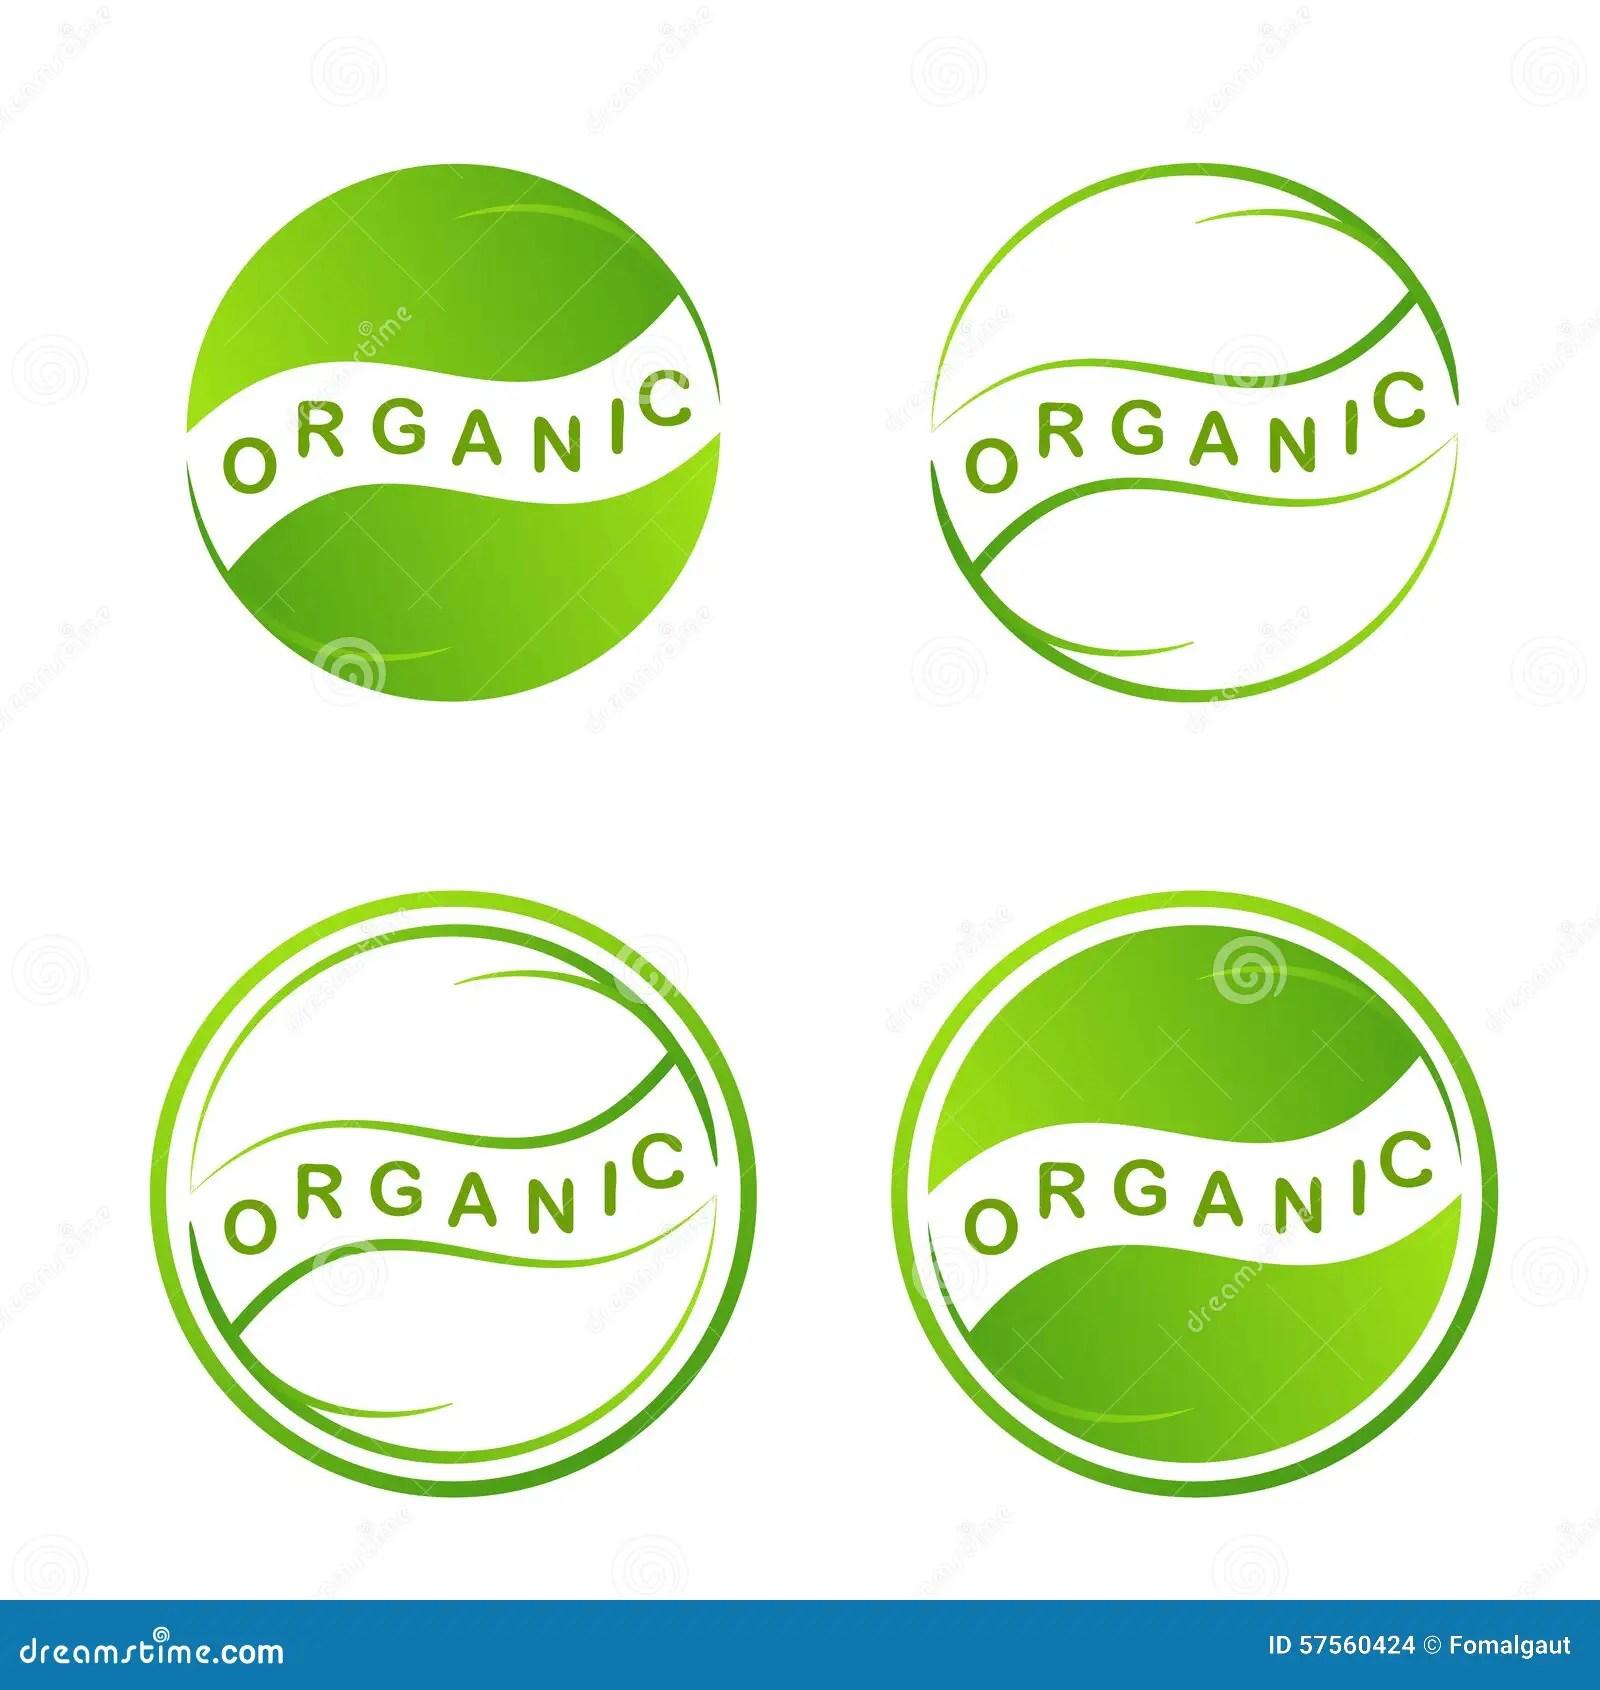 shrub graphic symbols diagram shark food chain eco ecology logo green leaf illustration cartoon vector